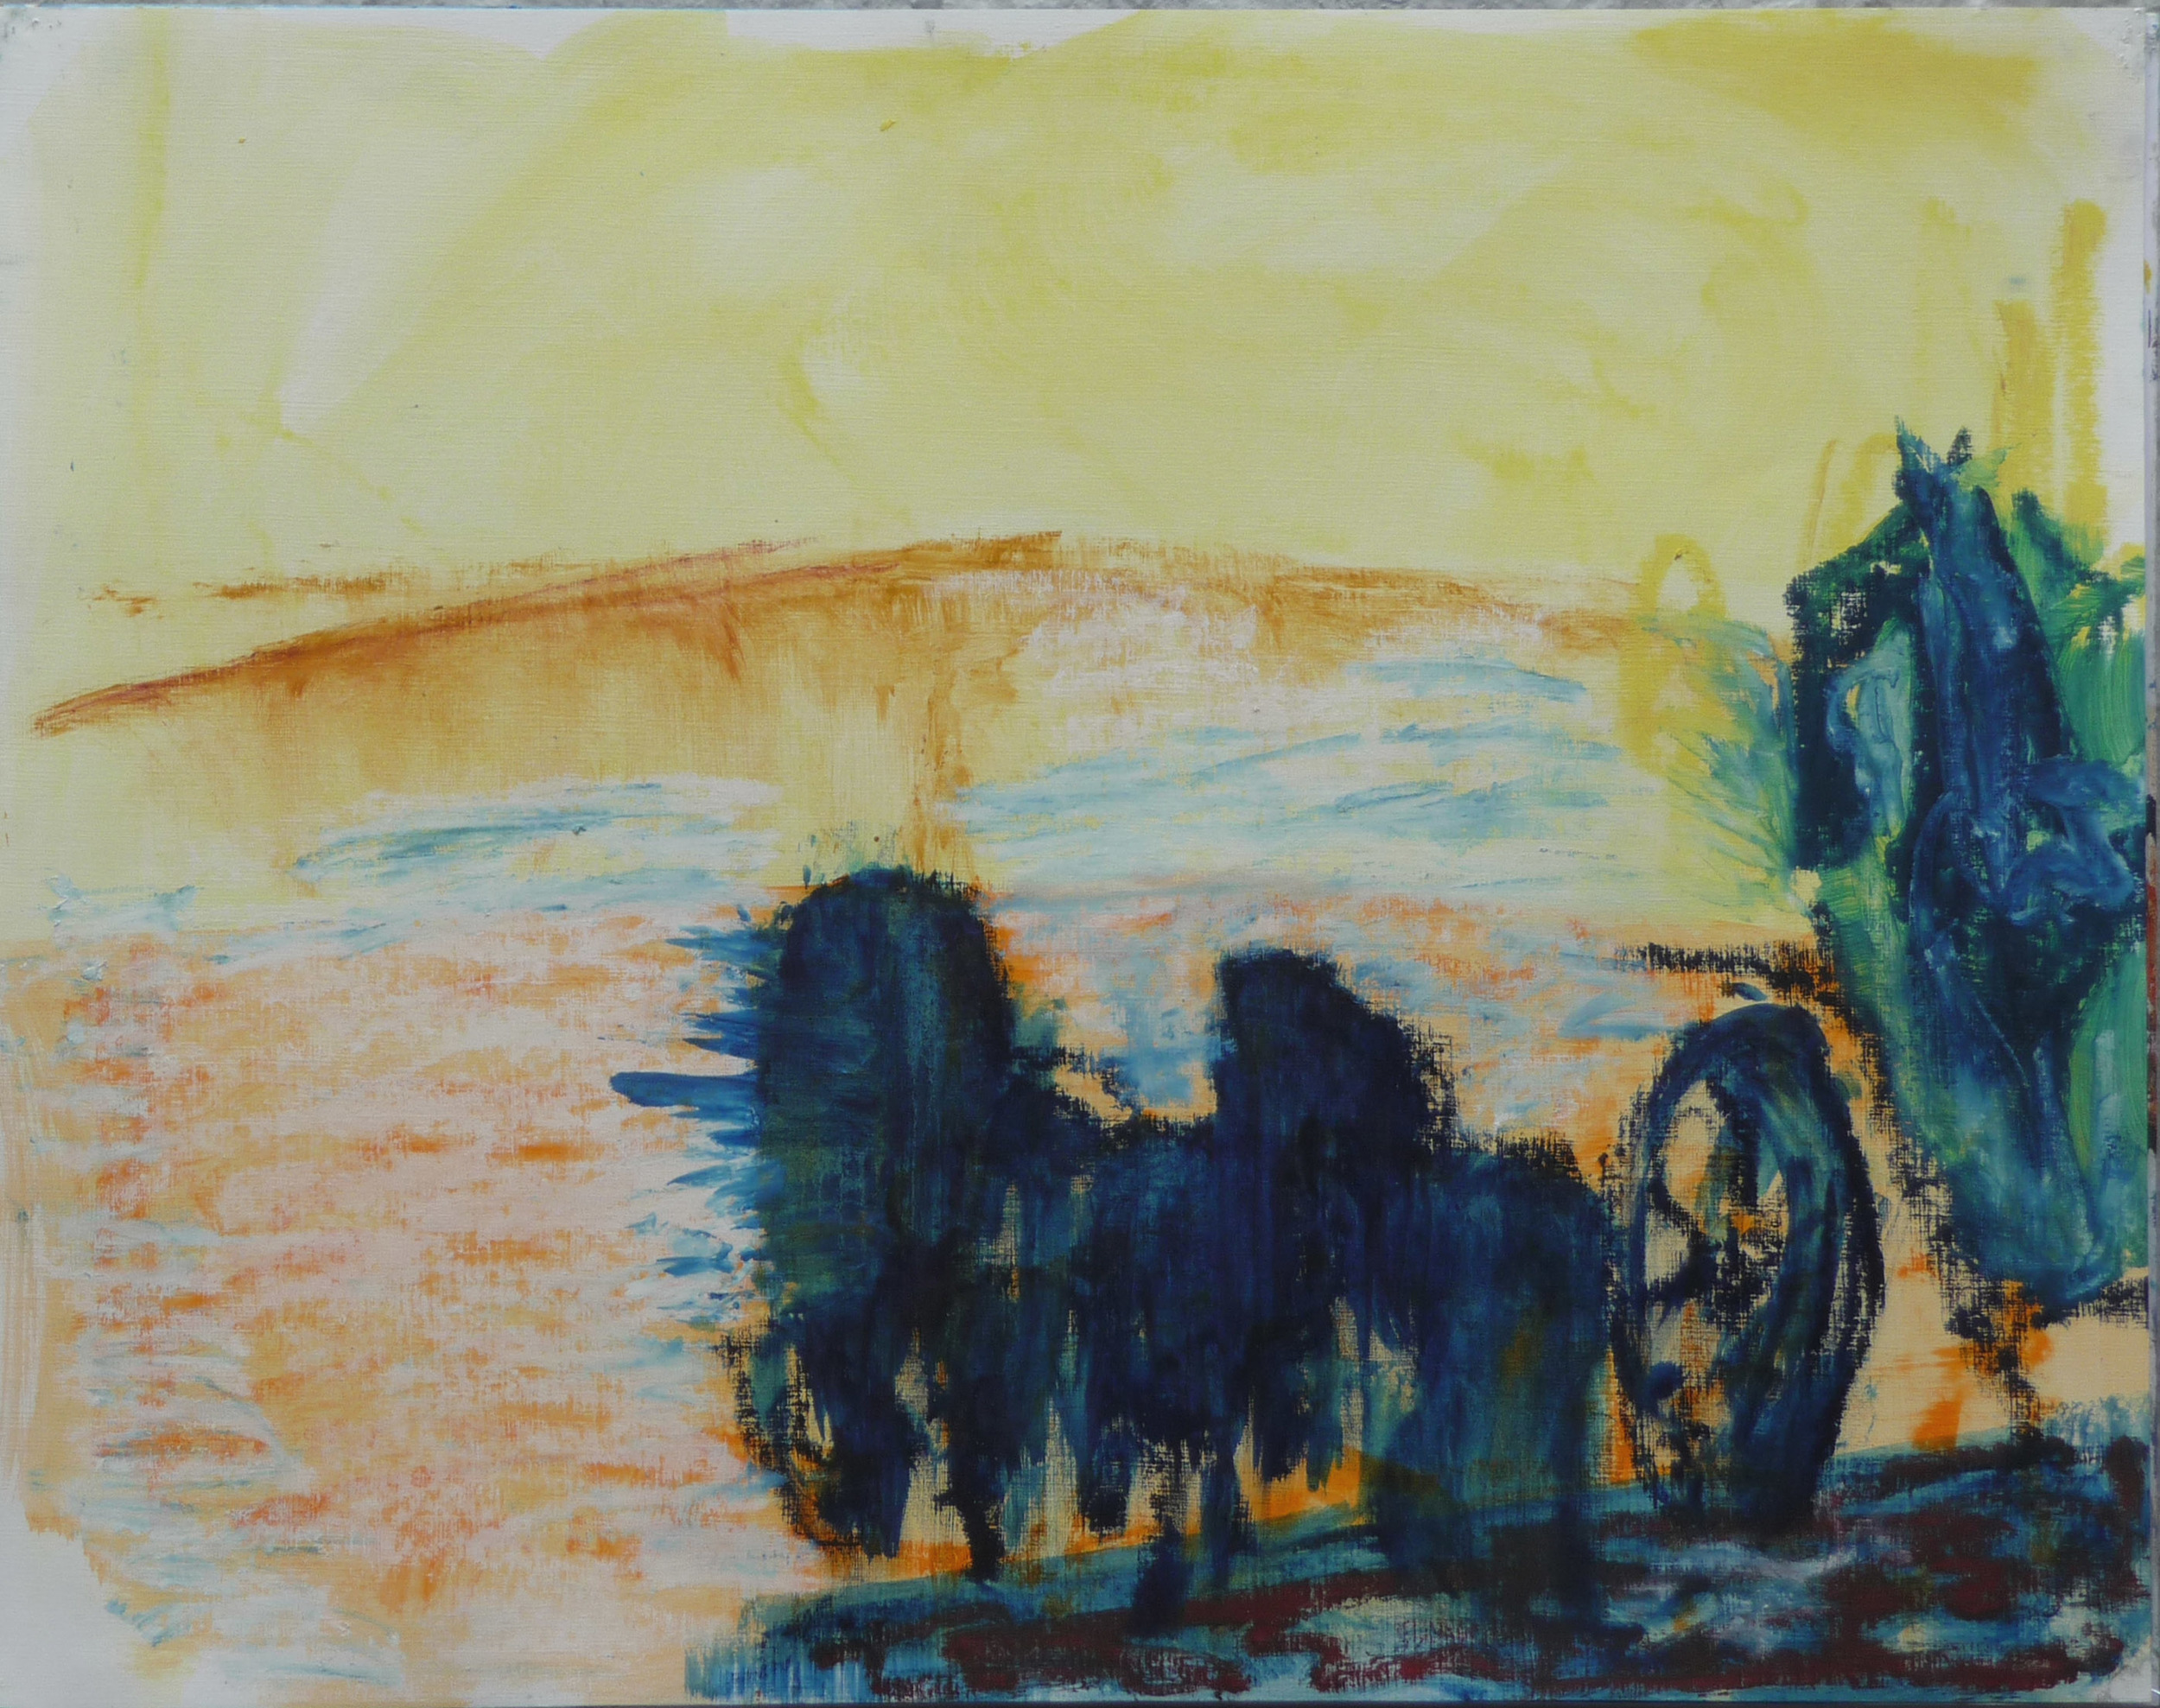 La Quardrilla 1, Olie baar op papier, 50 x 64 cm